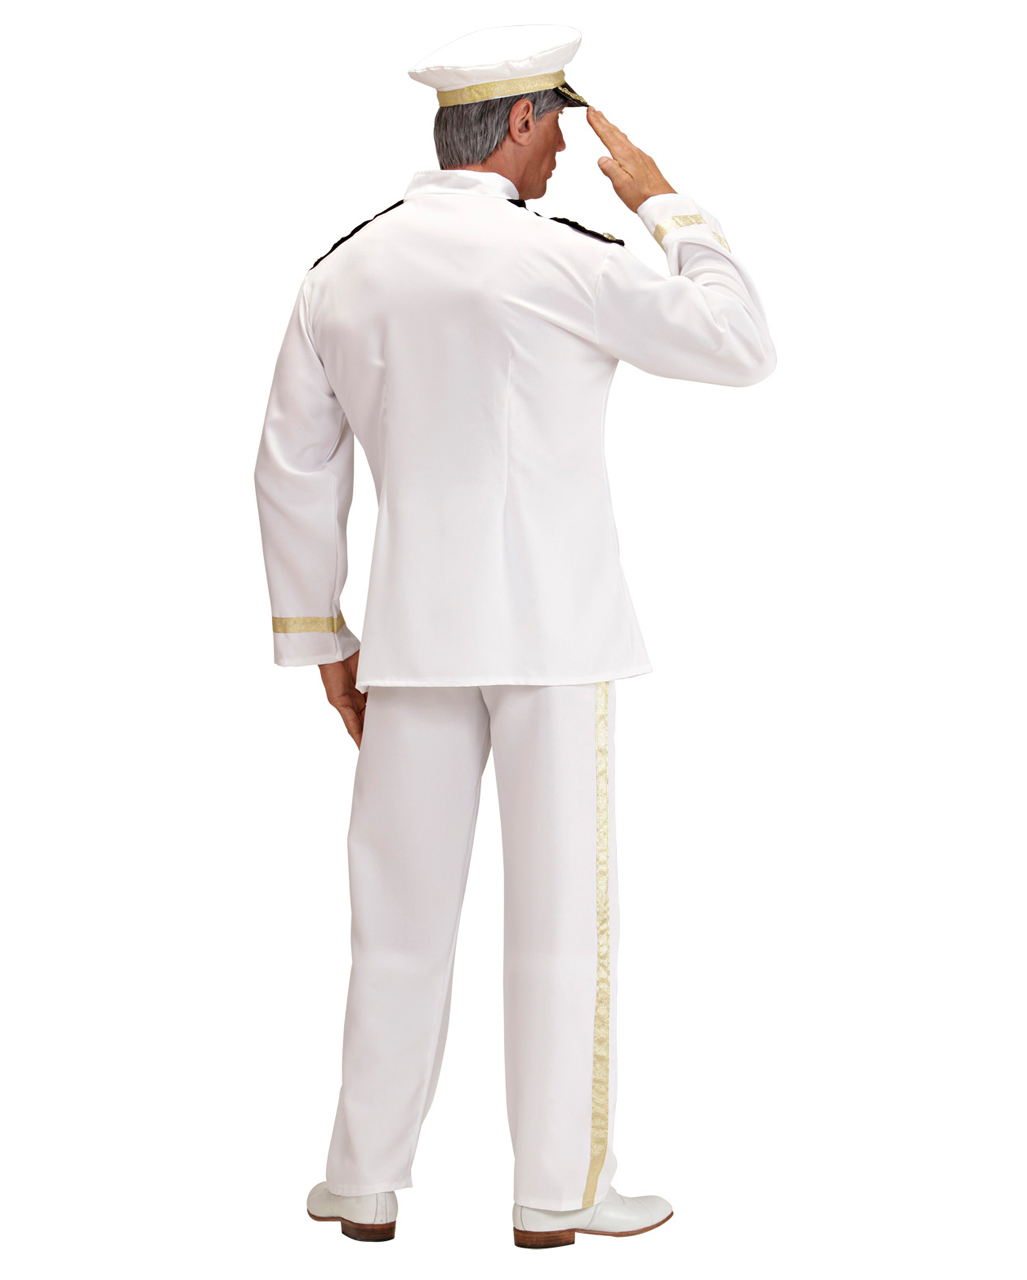 marine kapit n kost m m kapit n marinekapit n uniform. Black Bedroom Furniture Sets. Home Design Ideas